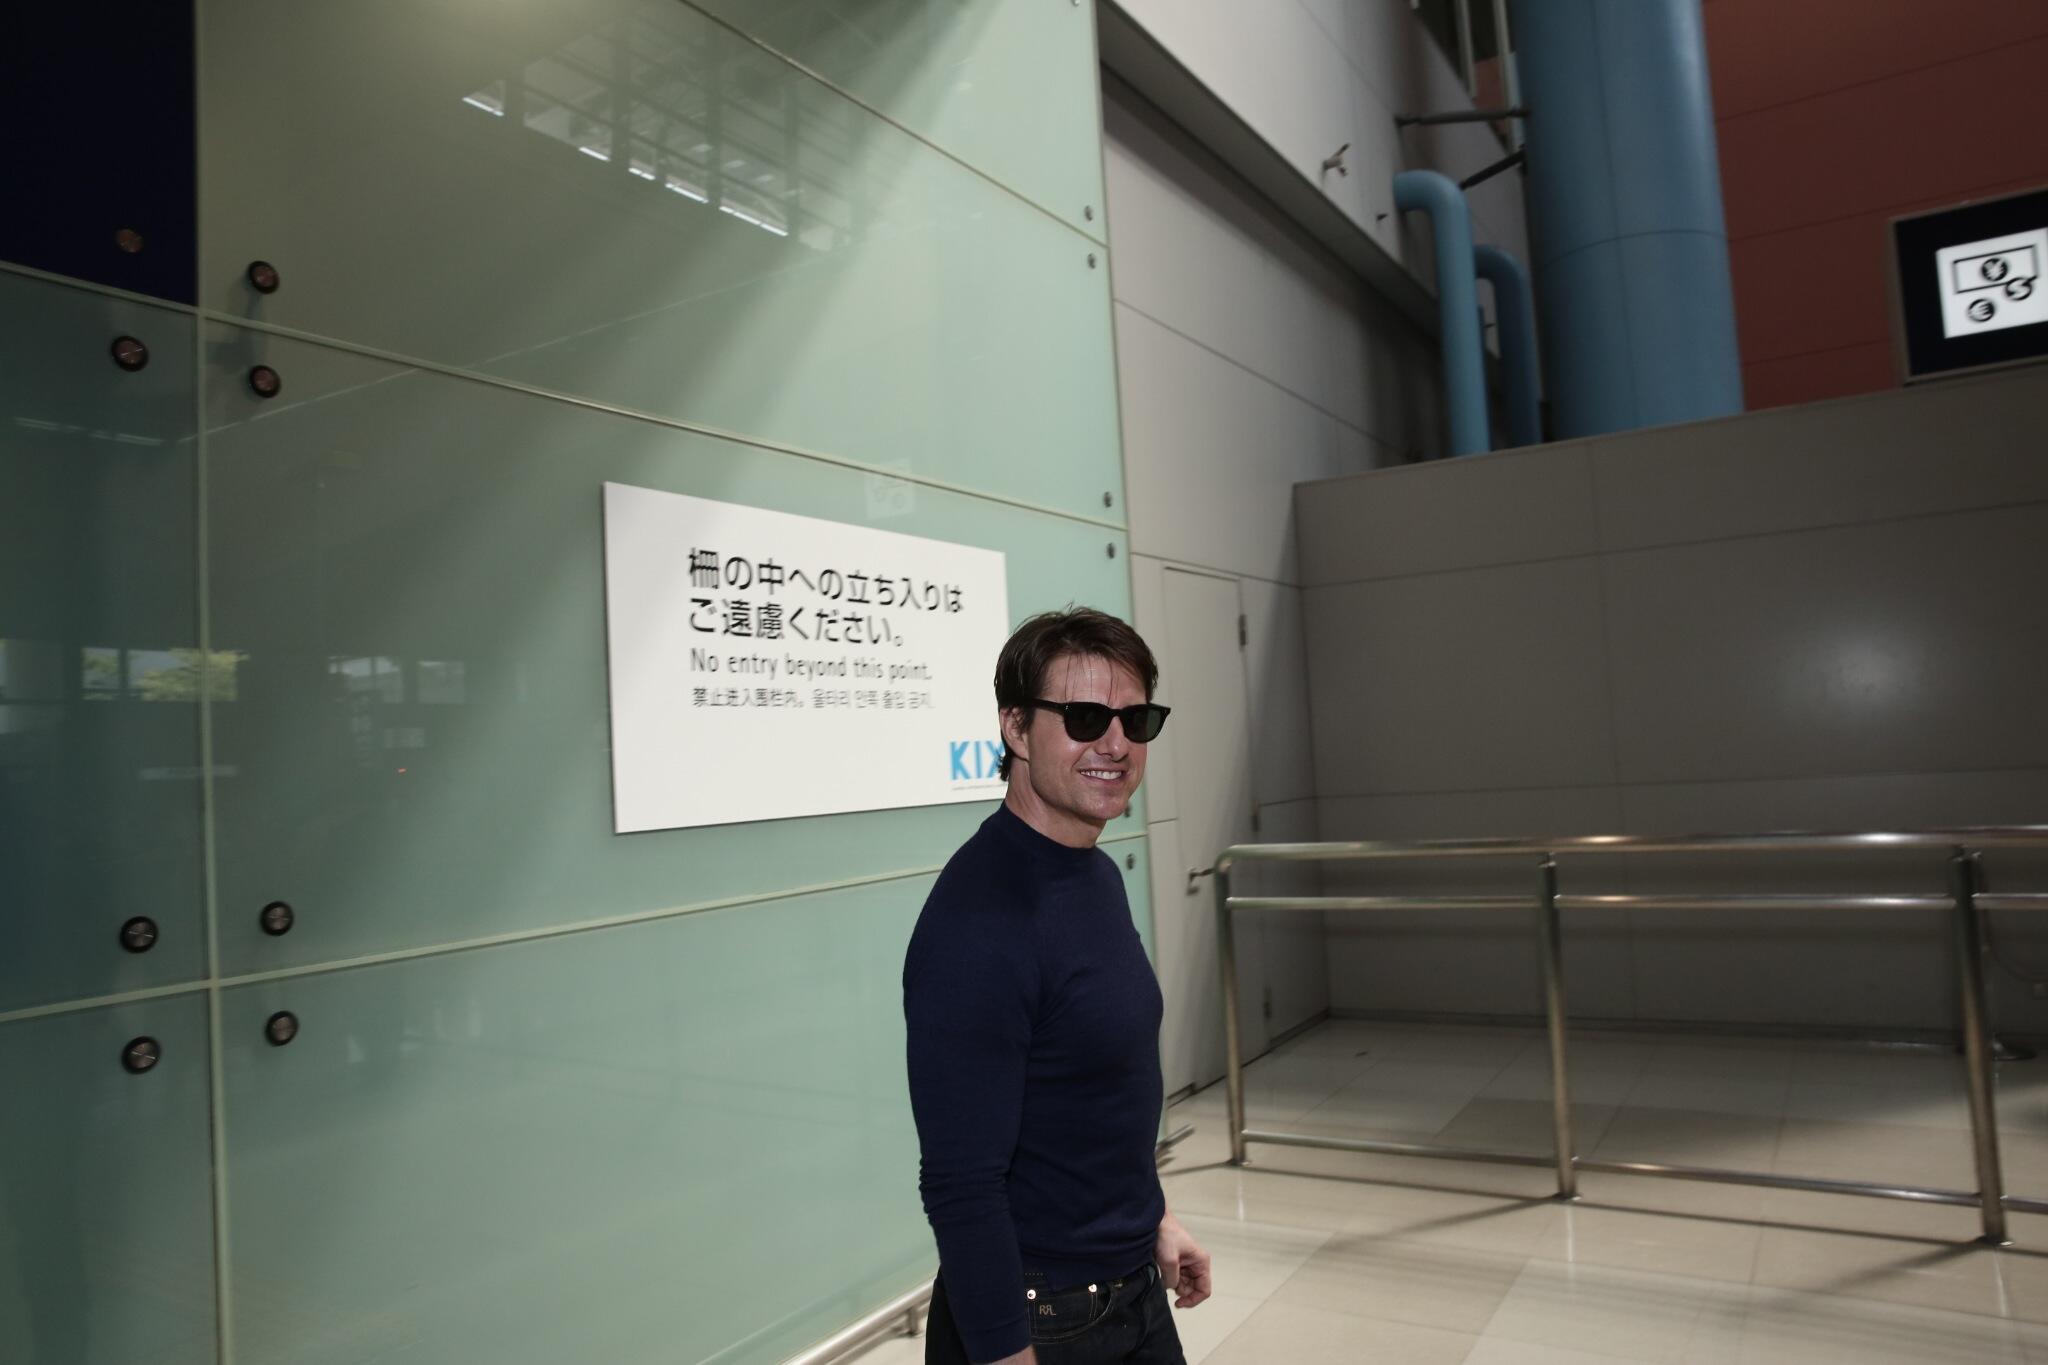 Twitter / TomCruise: Konnichiwa, Osaka! I'm in ...